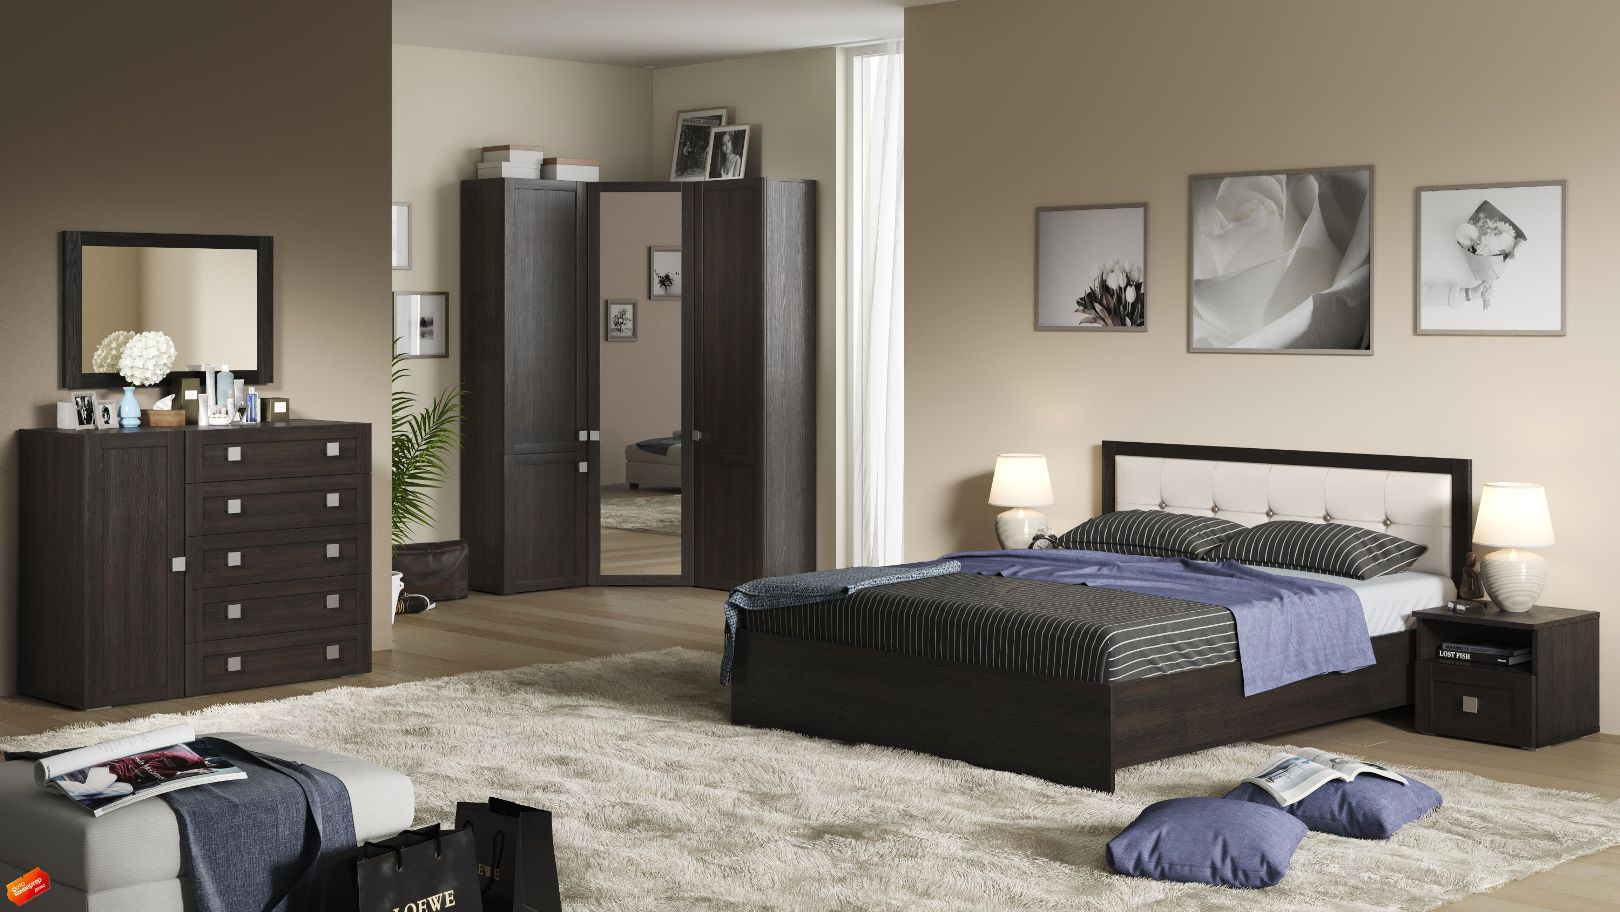 Модульная спальня Корсика Композиция-3 фото